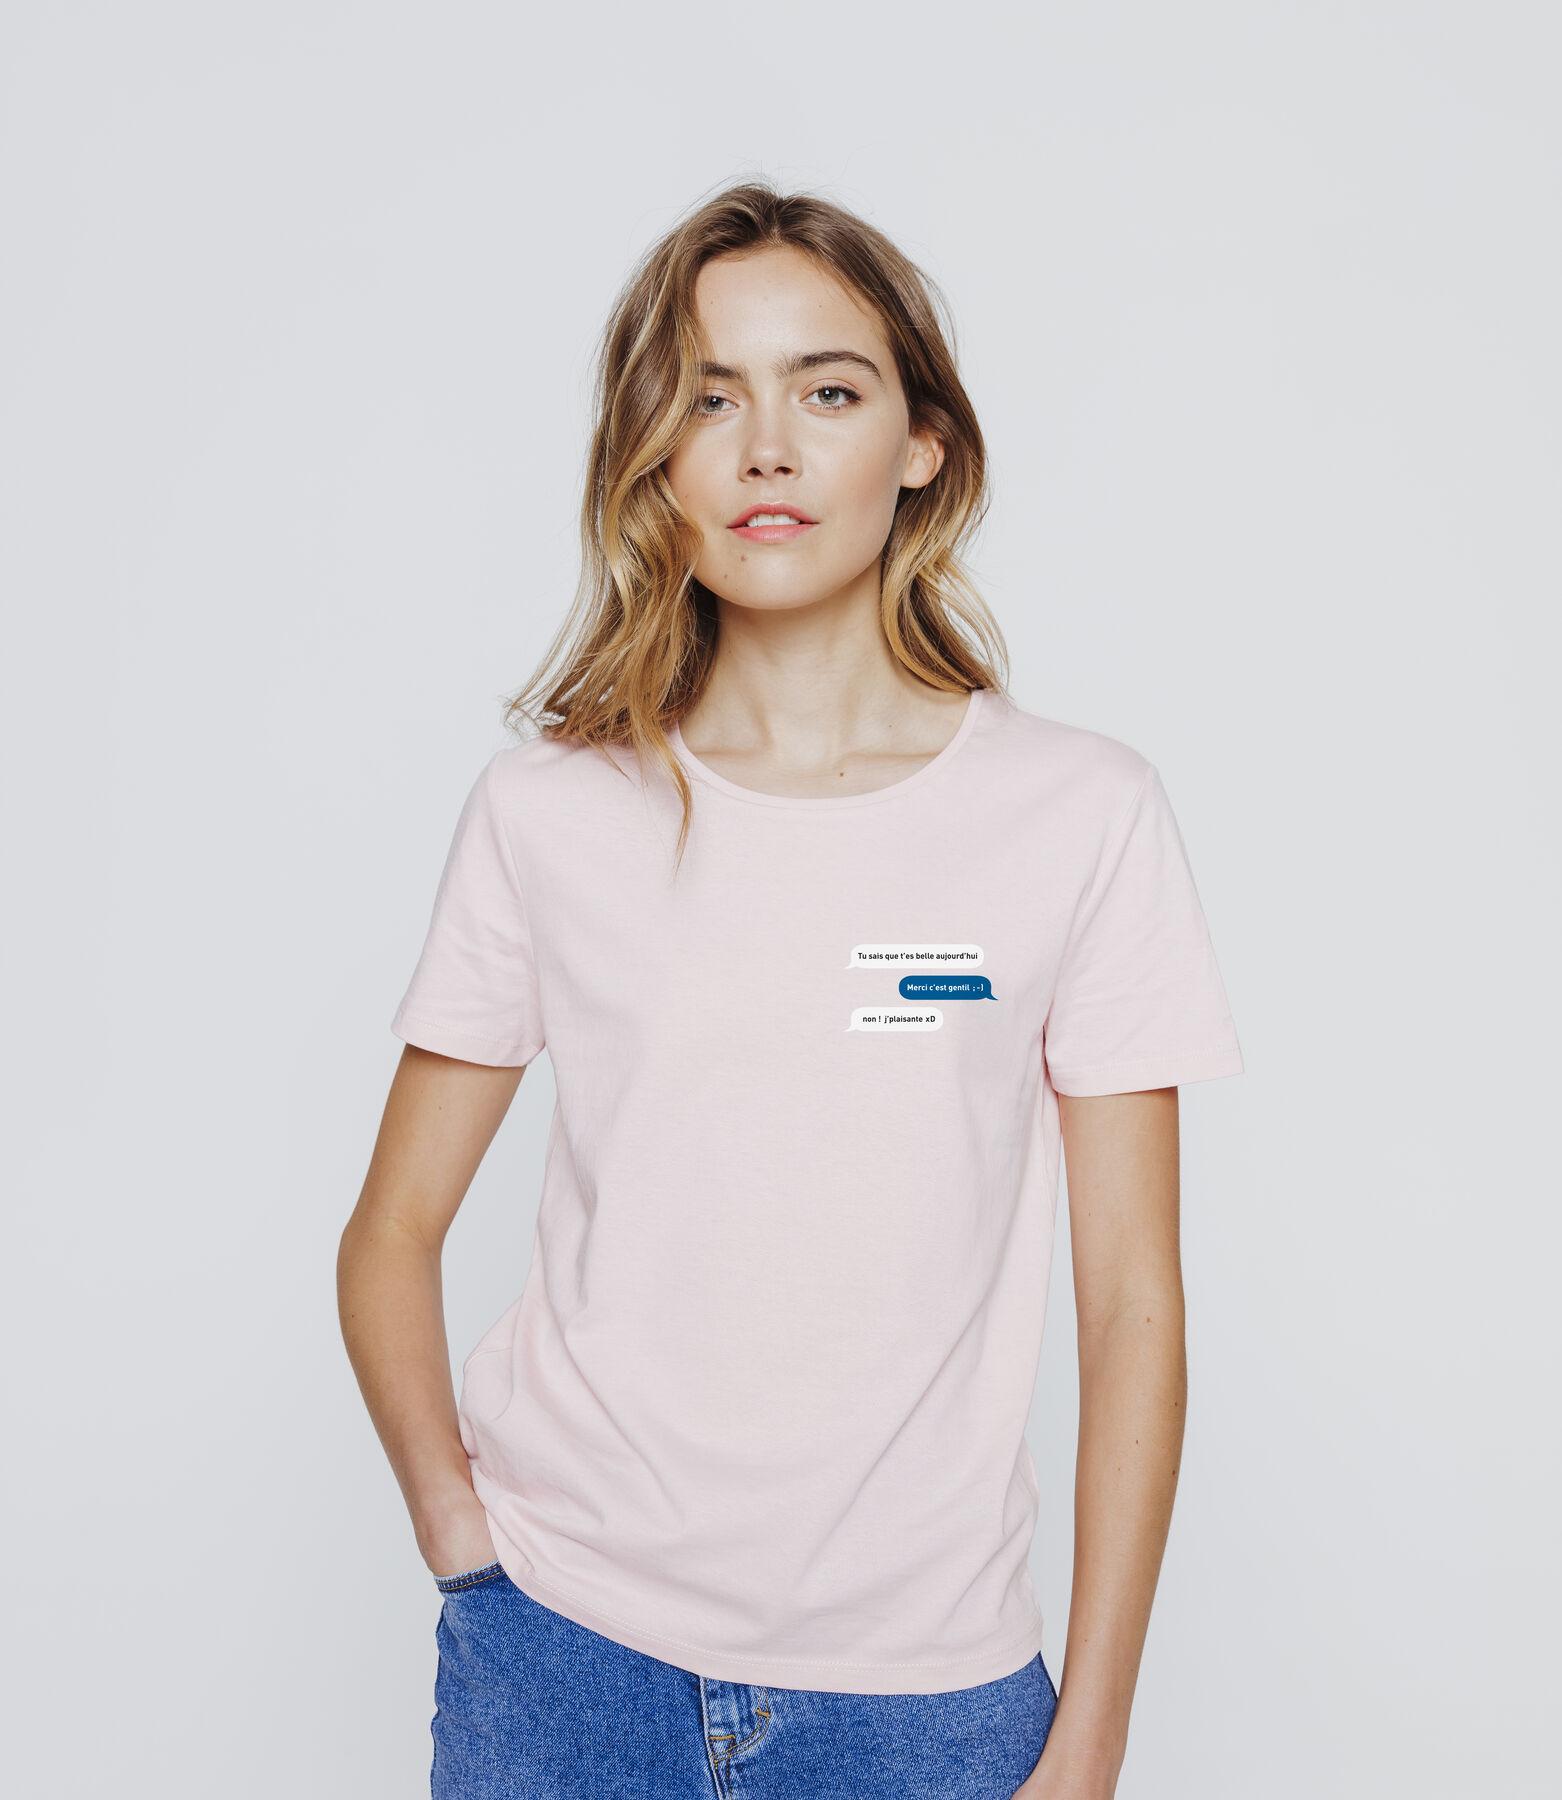 T-shirt message humour façon texto